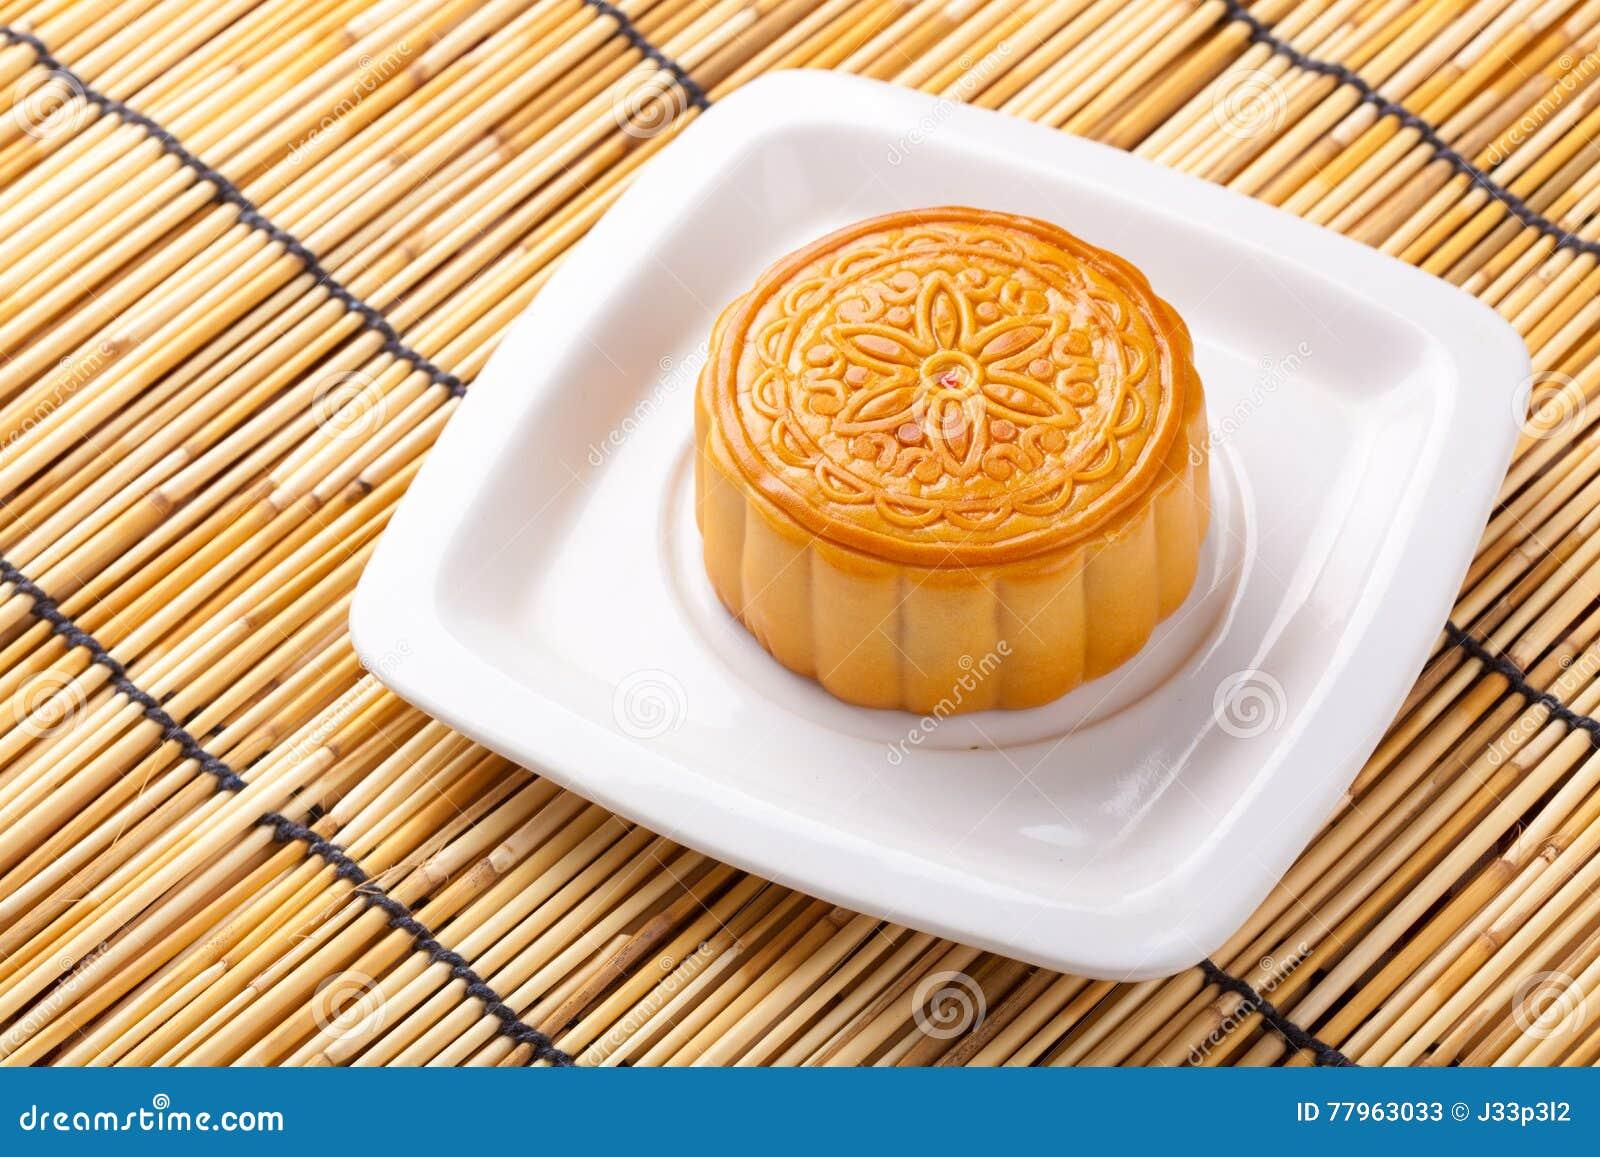 Mooncake And Tea On Bamboo Background Stock Image - Image of